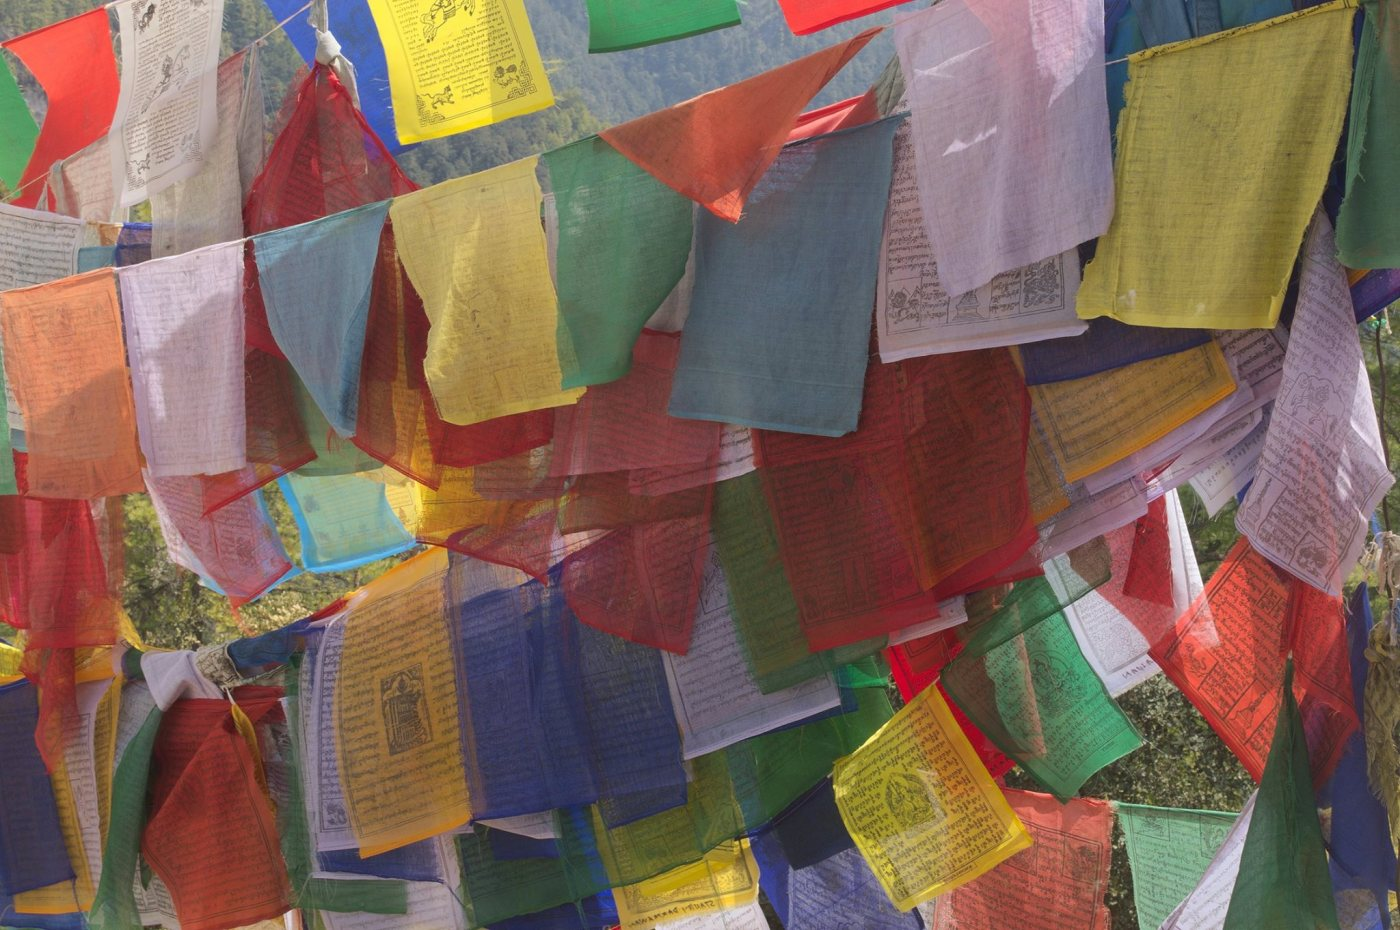 bhutan, nature, afurthershore, blog, altruism, troy-wilkinson, thoughtful, prayer flags